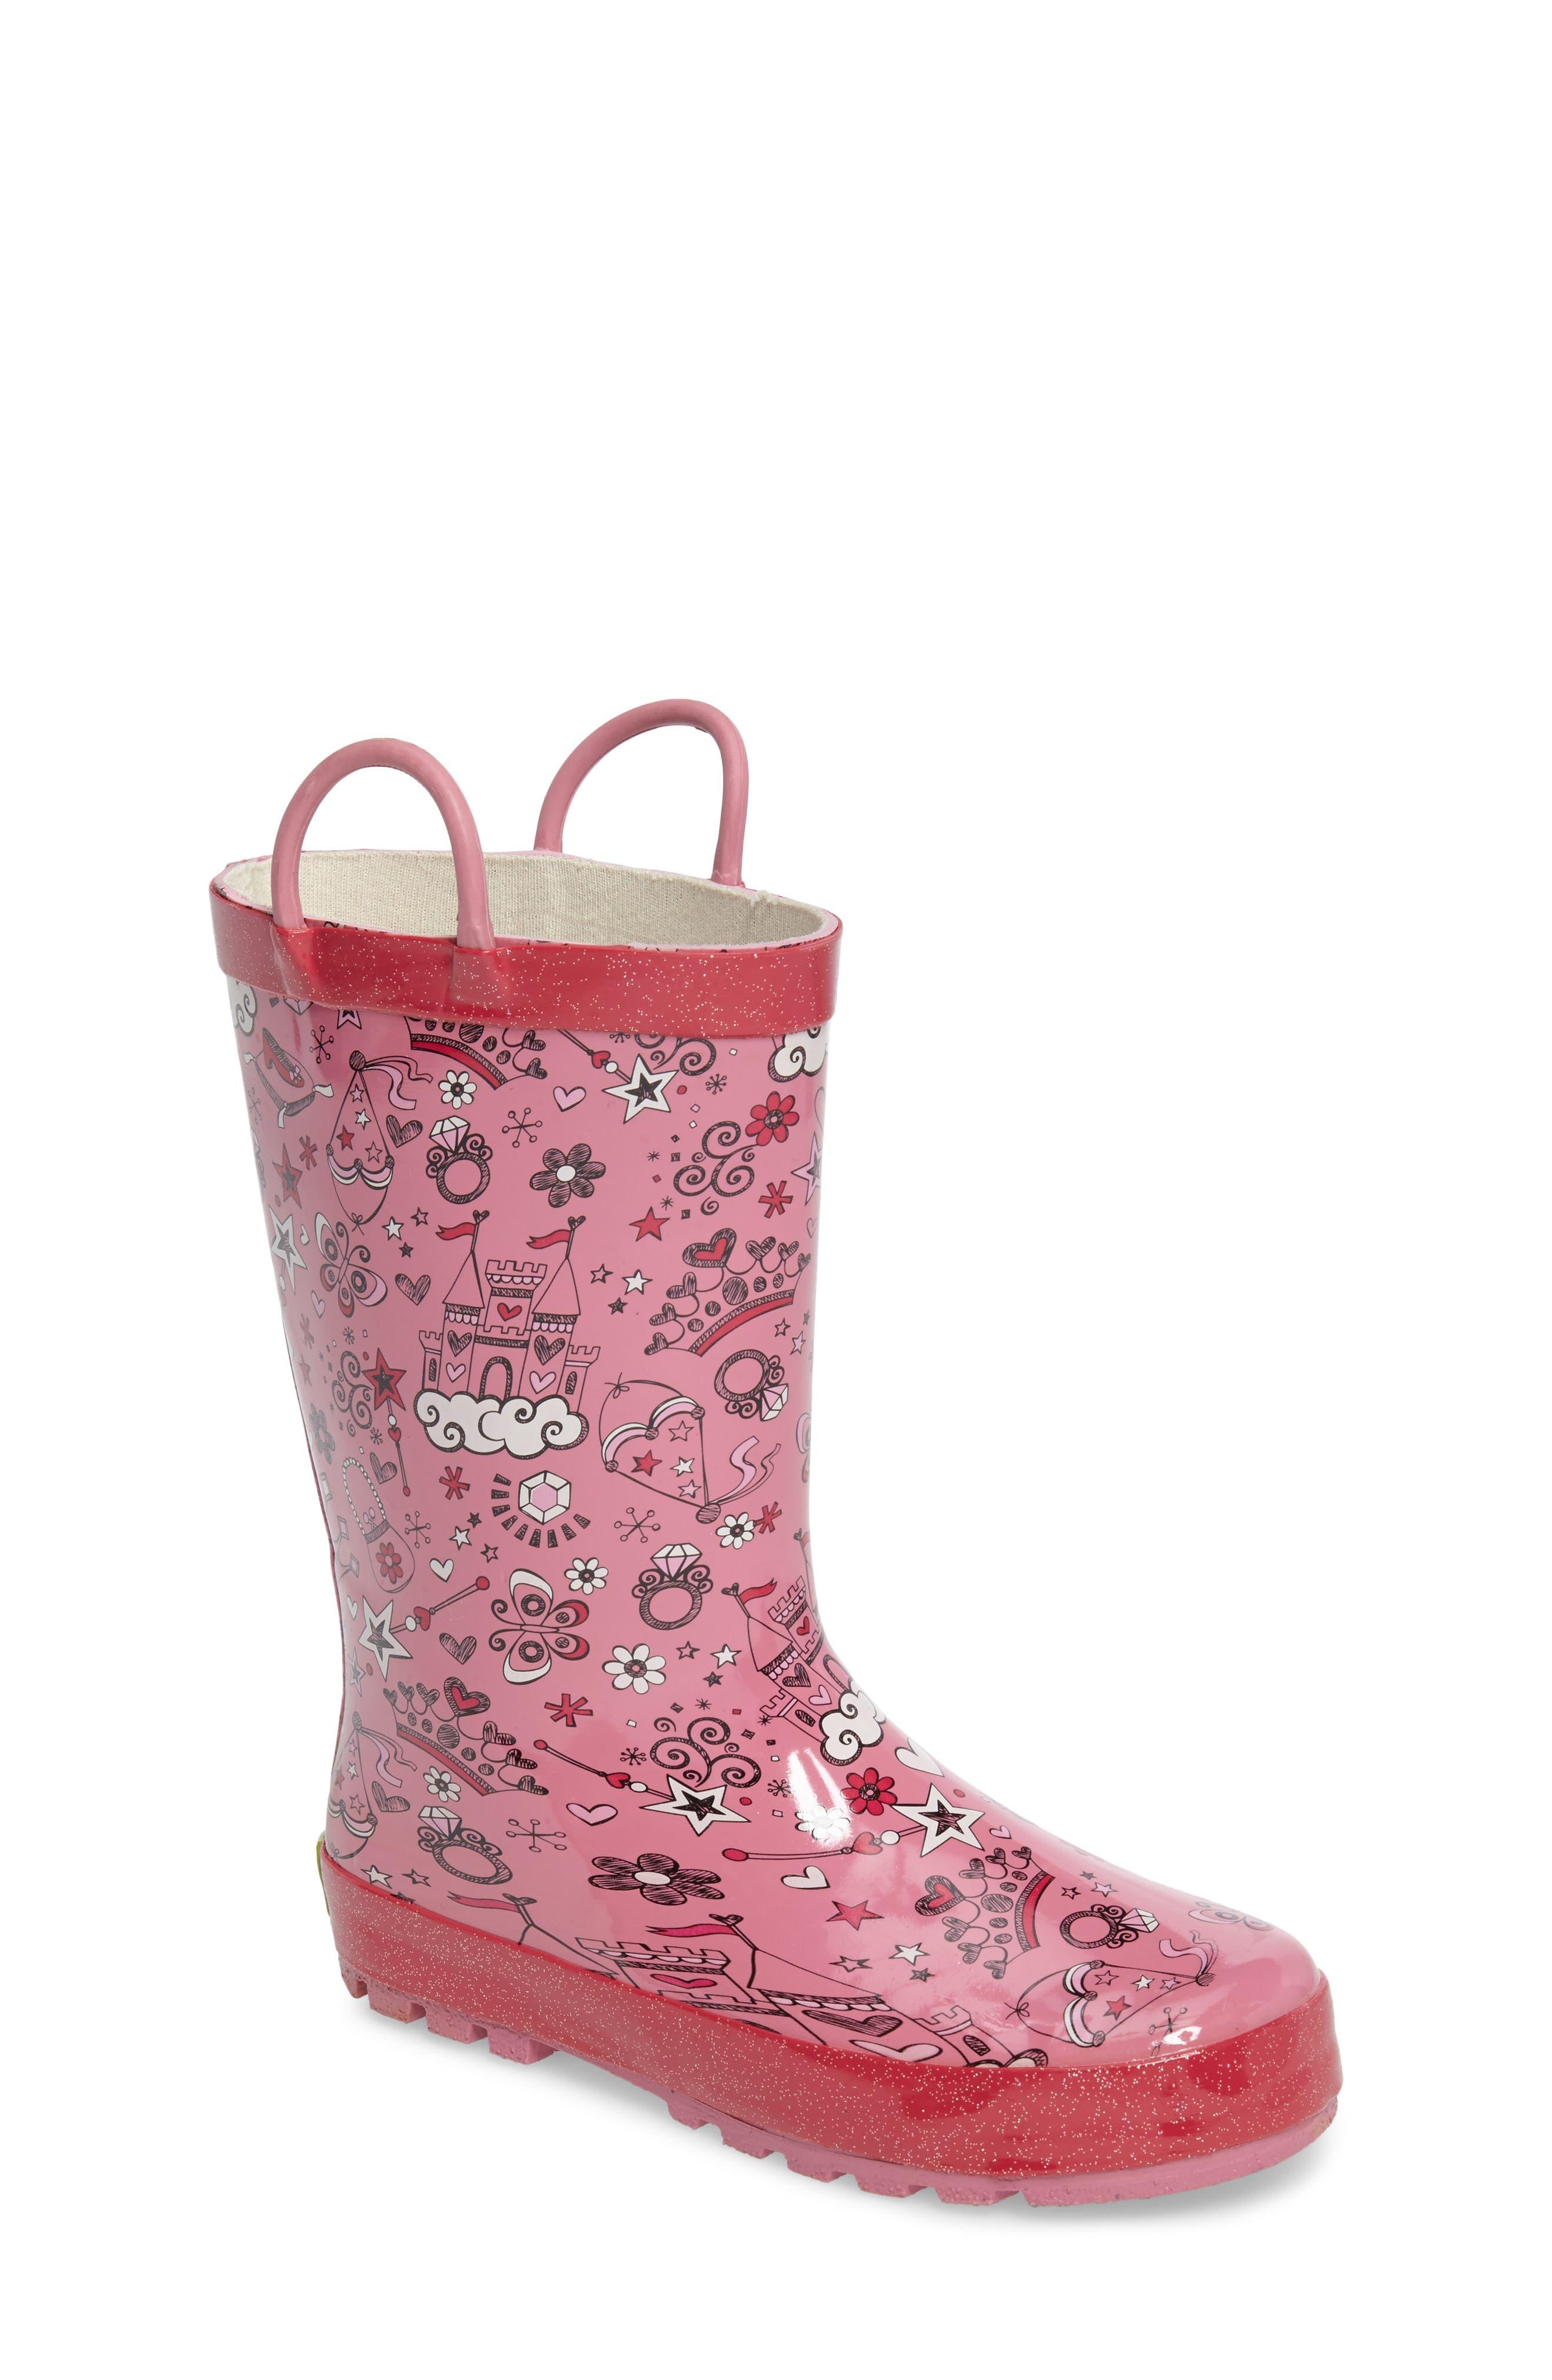 WESTERN CHIEF Fairy Tale Rain Boot